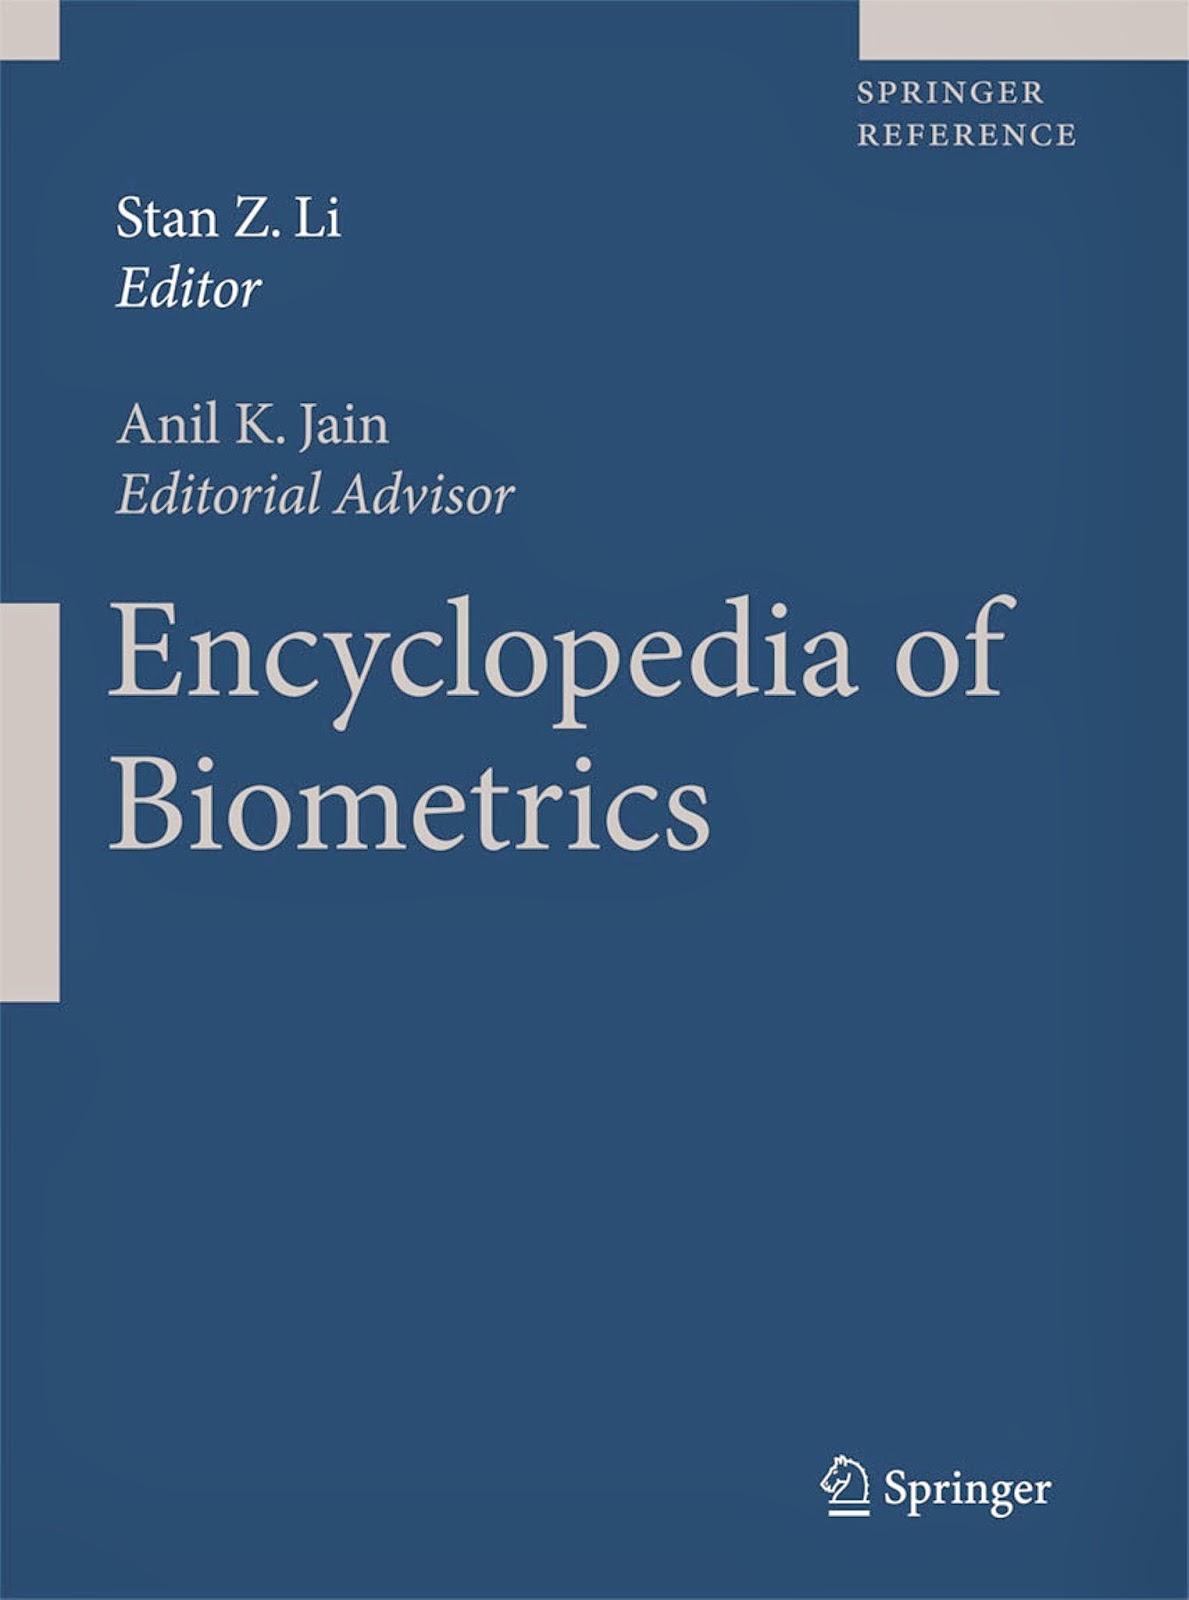 http://kingcheapebook.blogspot.com/2014/03/encyclopedia-of-biometrics.html